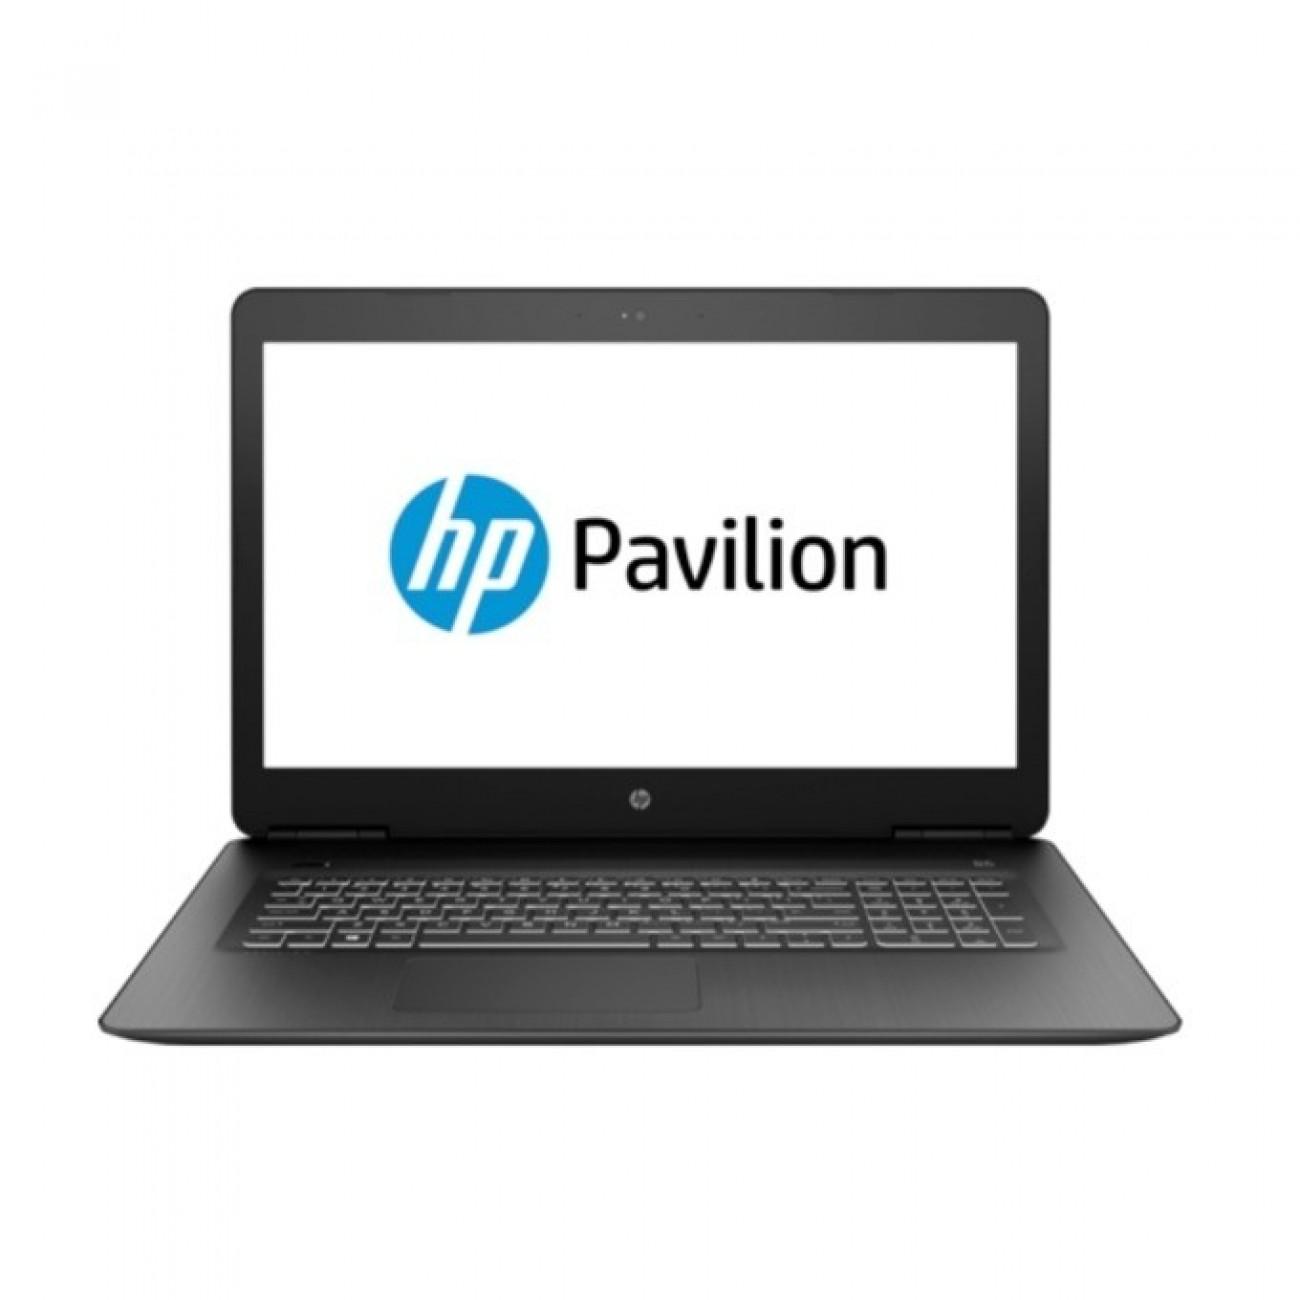 Лаптоп HP Pavilion 17-ab401nu (4MU13EA), шестядрен Coffee Lake Intel Core i7-8750H 2.2/4.1 GHz, 17.3 (43.94 cm) Full HD IPS Anti-Glare Display & GF GTX 1050 Ti 4GB, (HDMI), 8GB DDR4, 256GB SSD & 1TB HDD, 2x USB 3.1, Free DOS, 3.07 kg в Лаптопи -